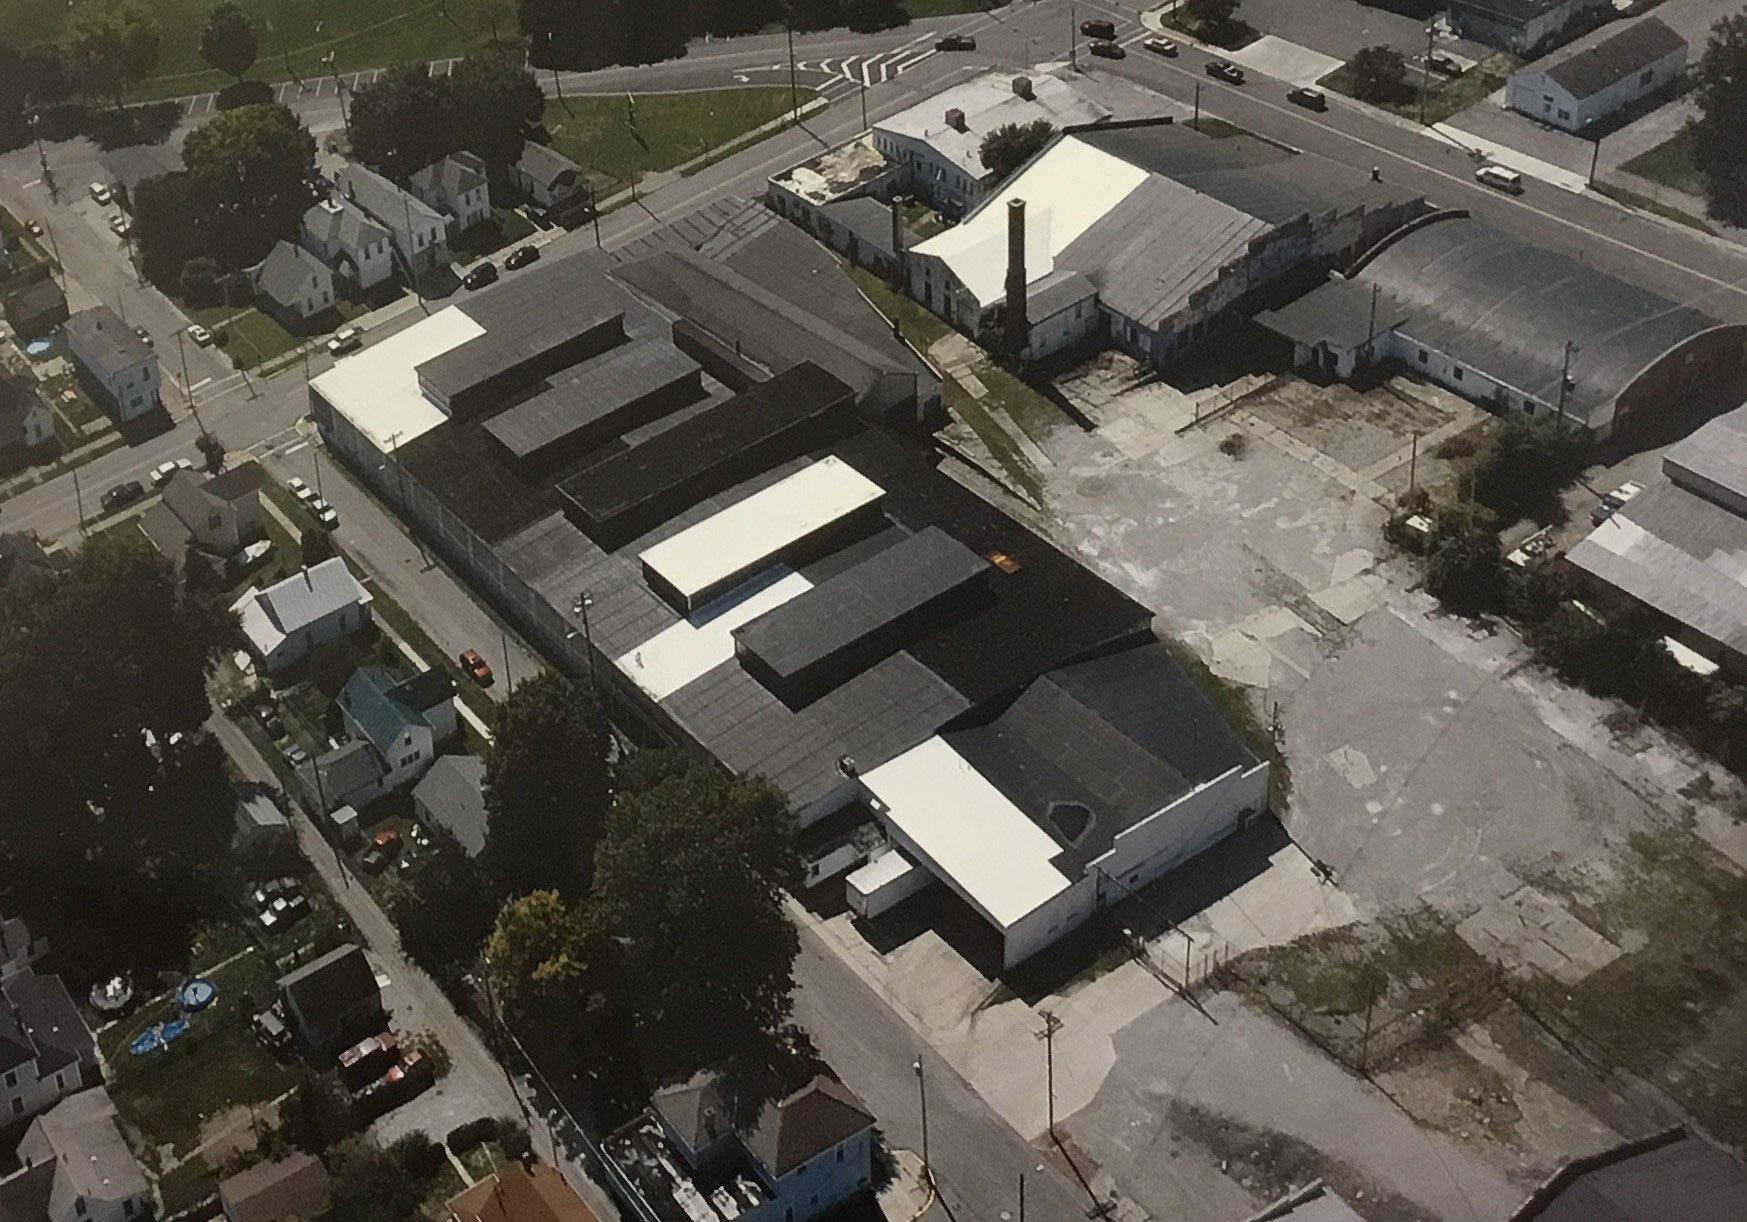 Black rooftop